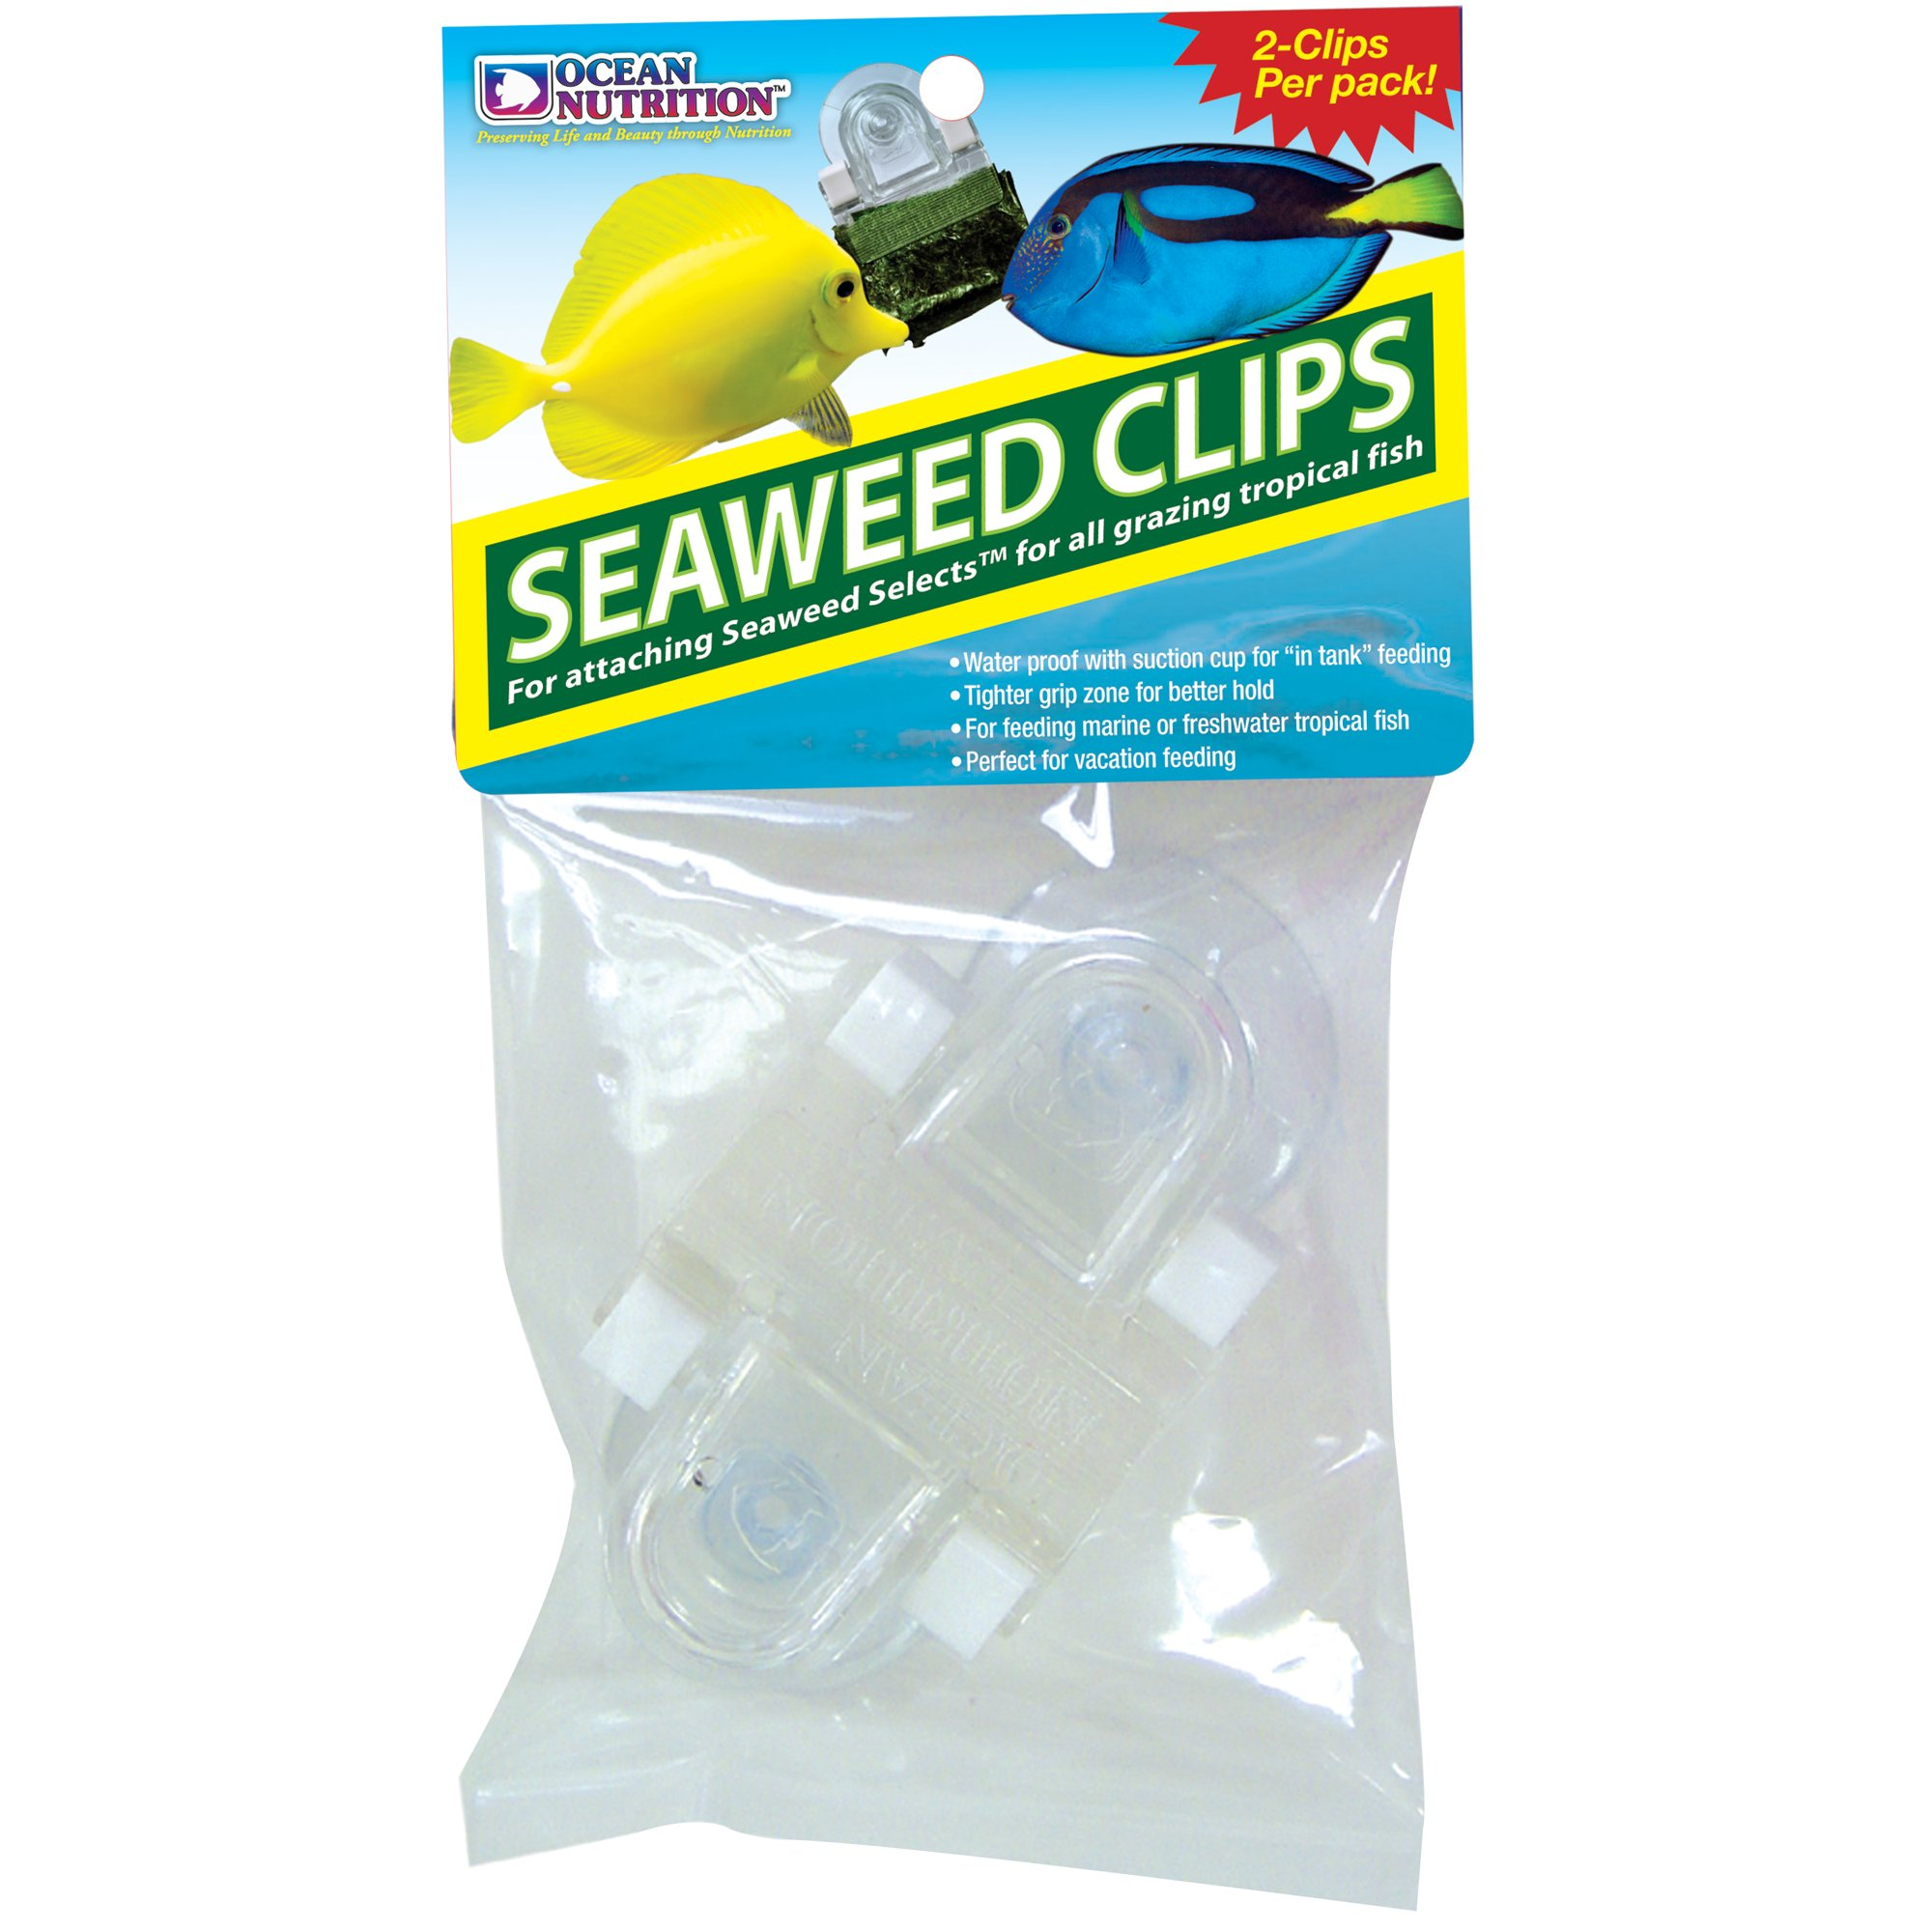 Ocean nutrition feeding frenzy seaweed clips petco for Feeder fish petco